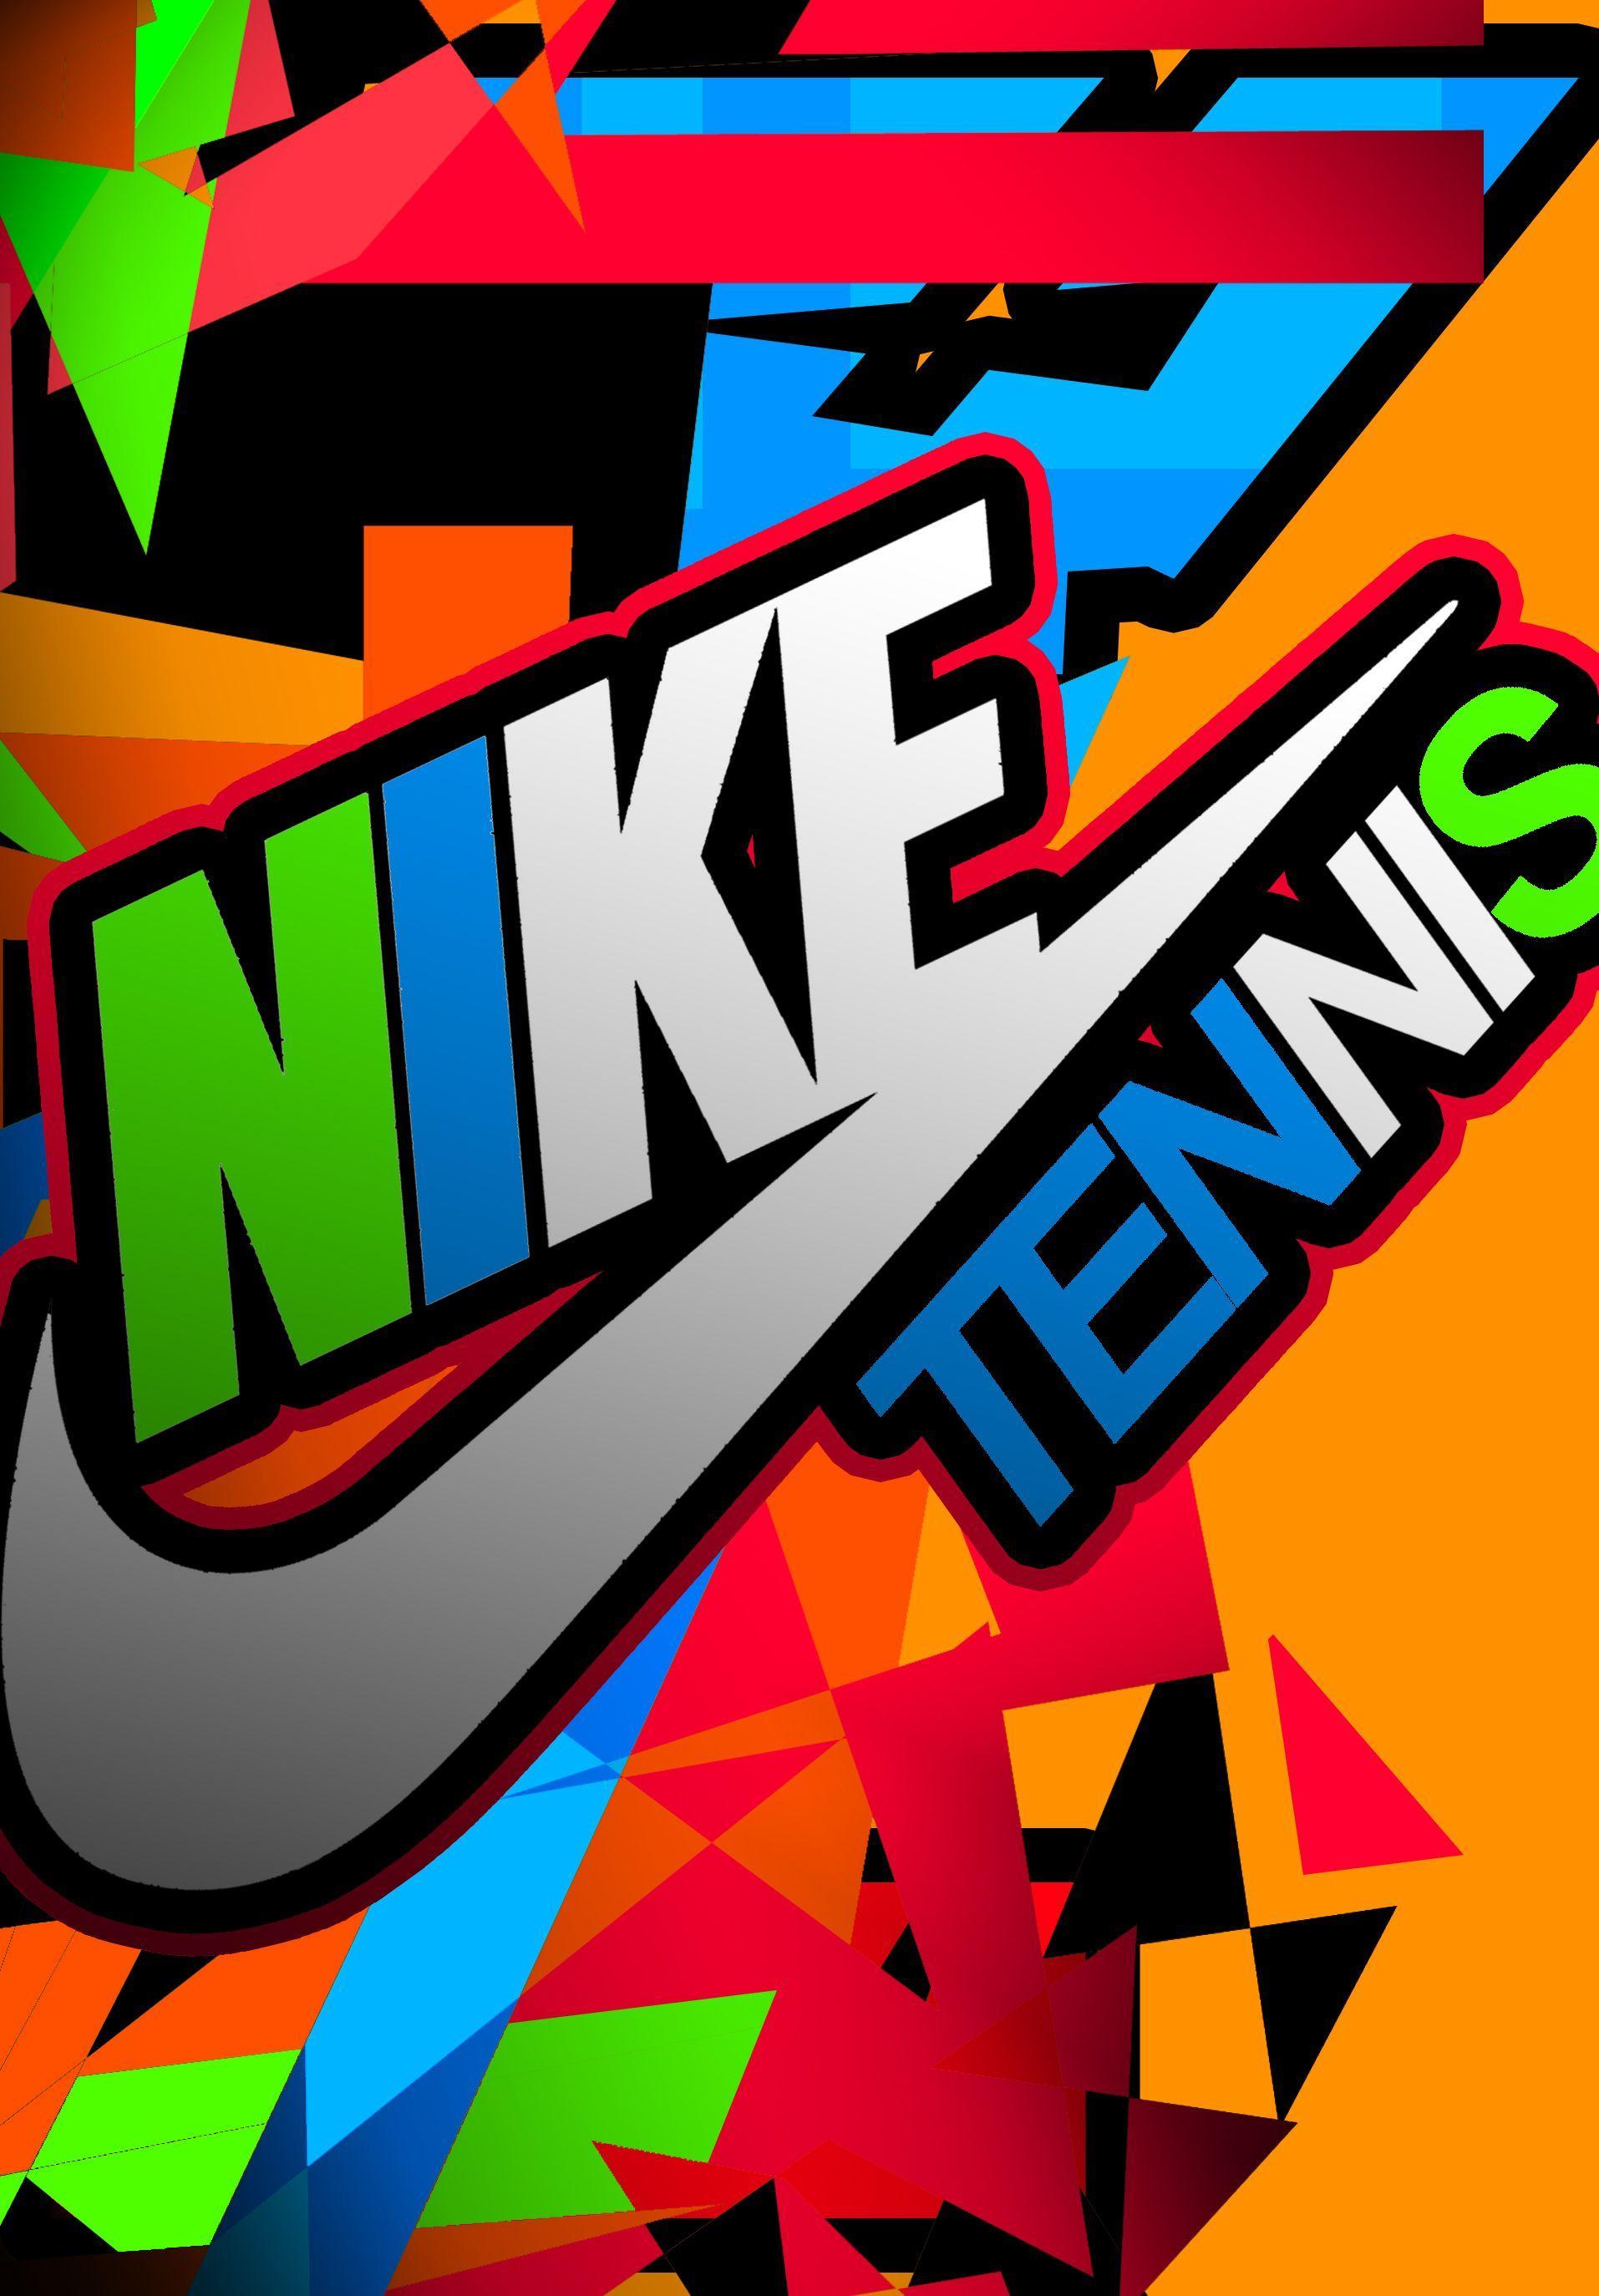 Nike Tennis Wallpapers Top Free Nike Tennis Backgrounds Wallpaperaccess